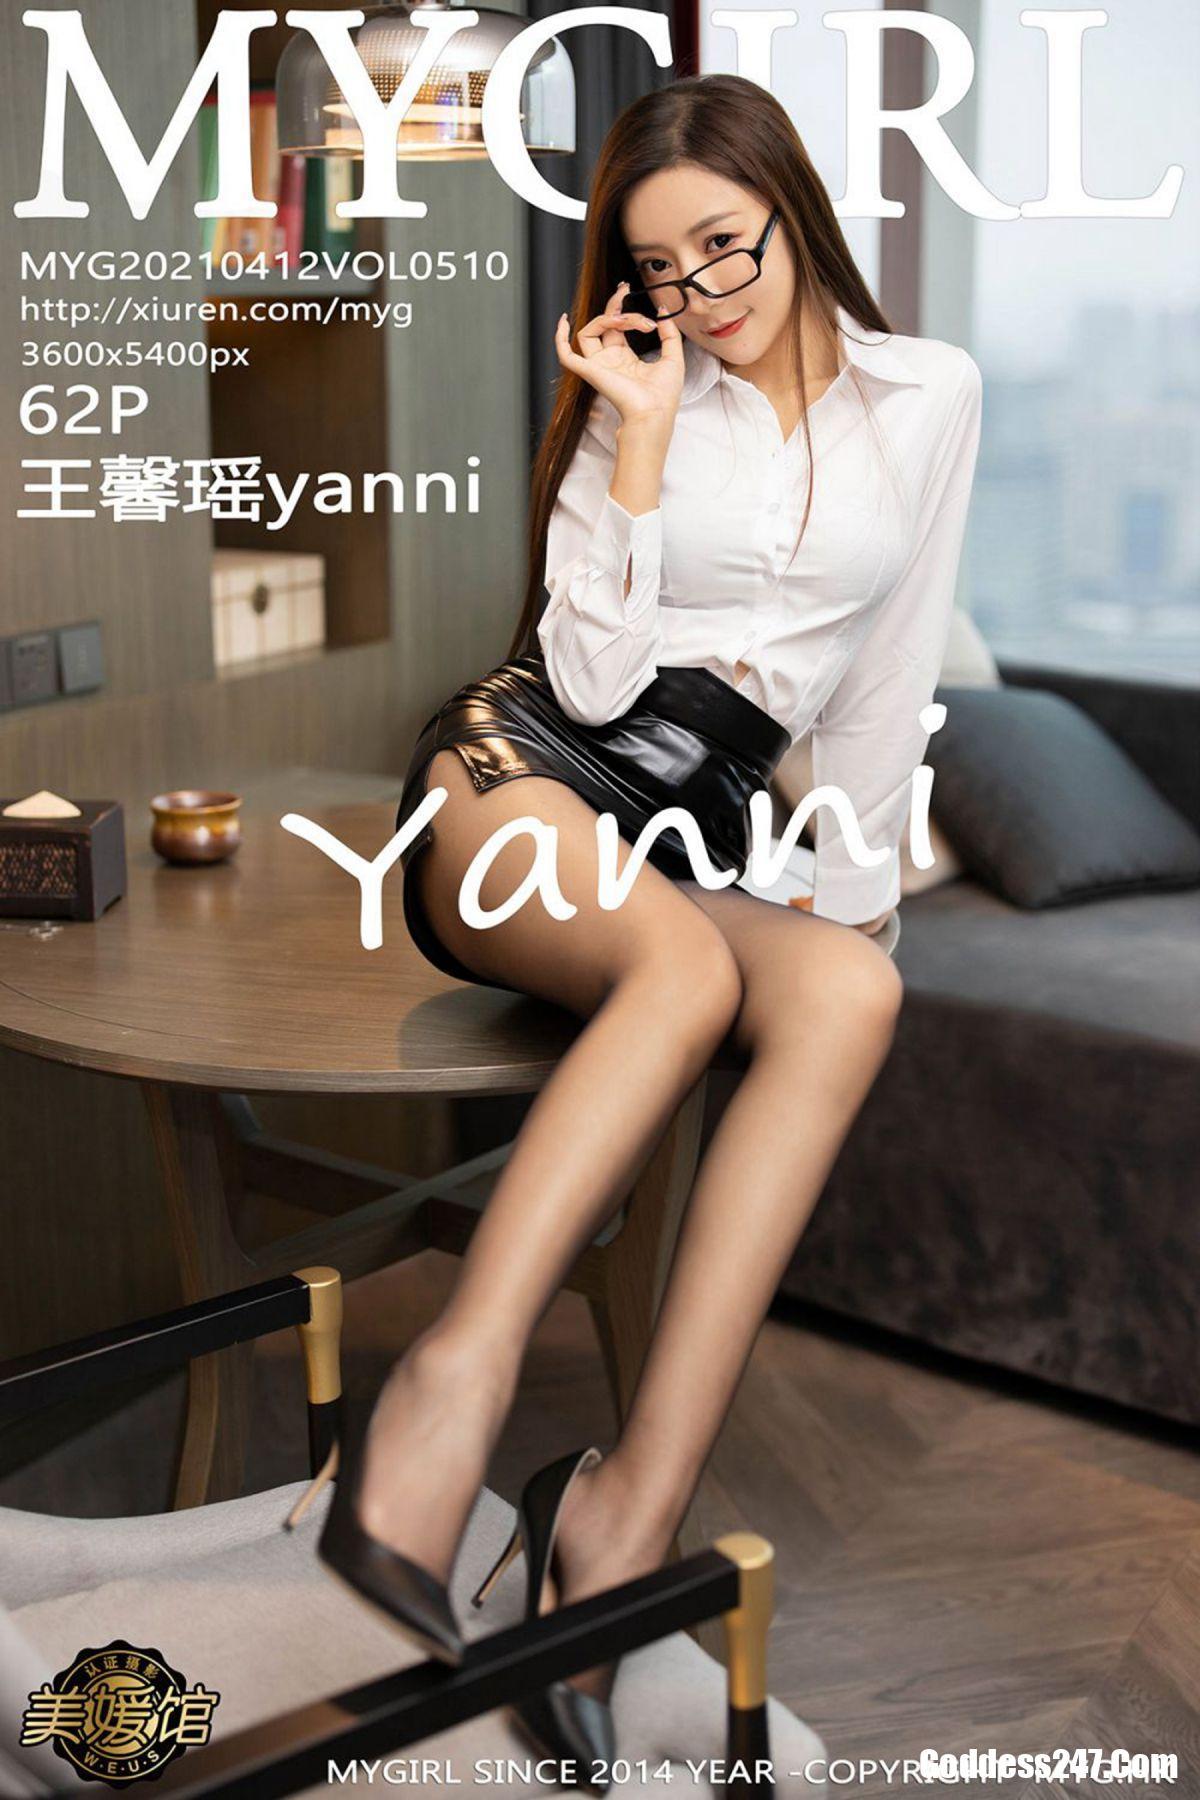 MyGirl美媛馆 Vol.510 王馨瑶yanni